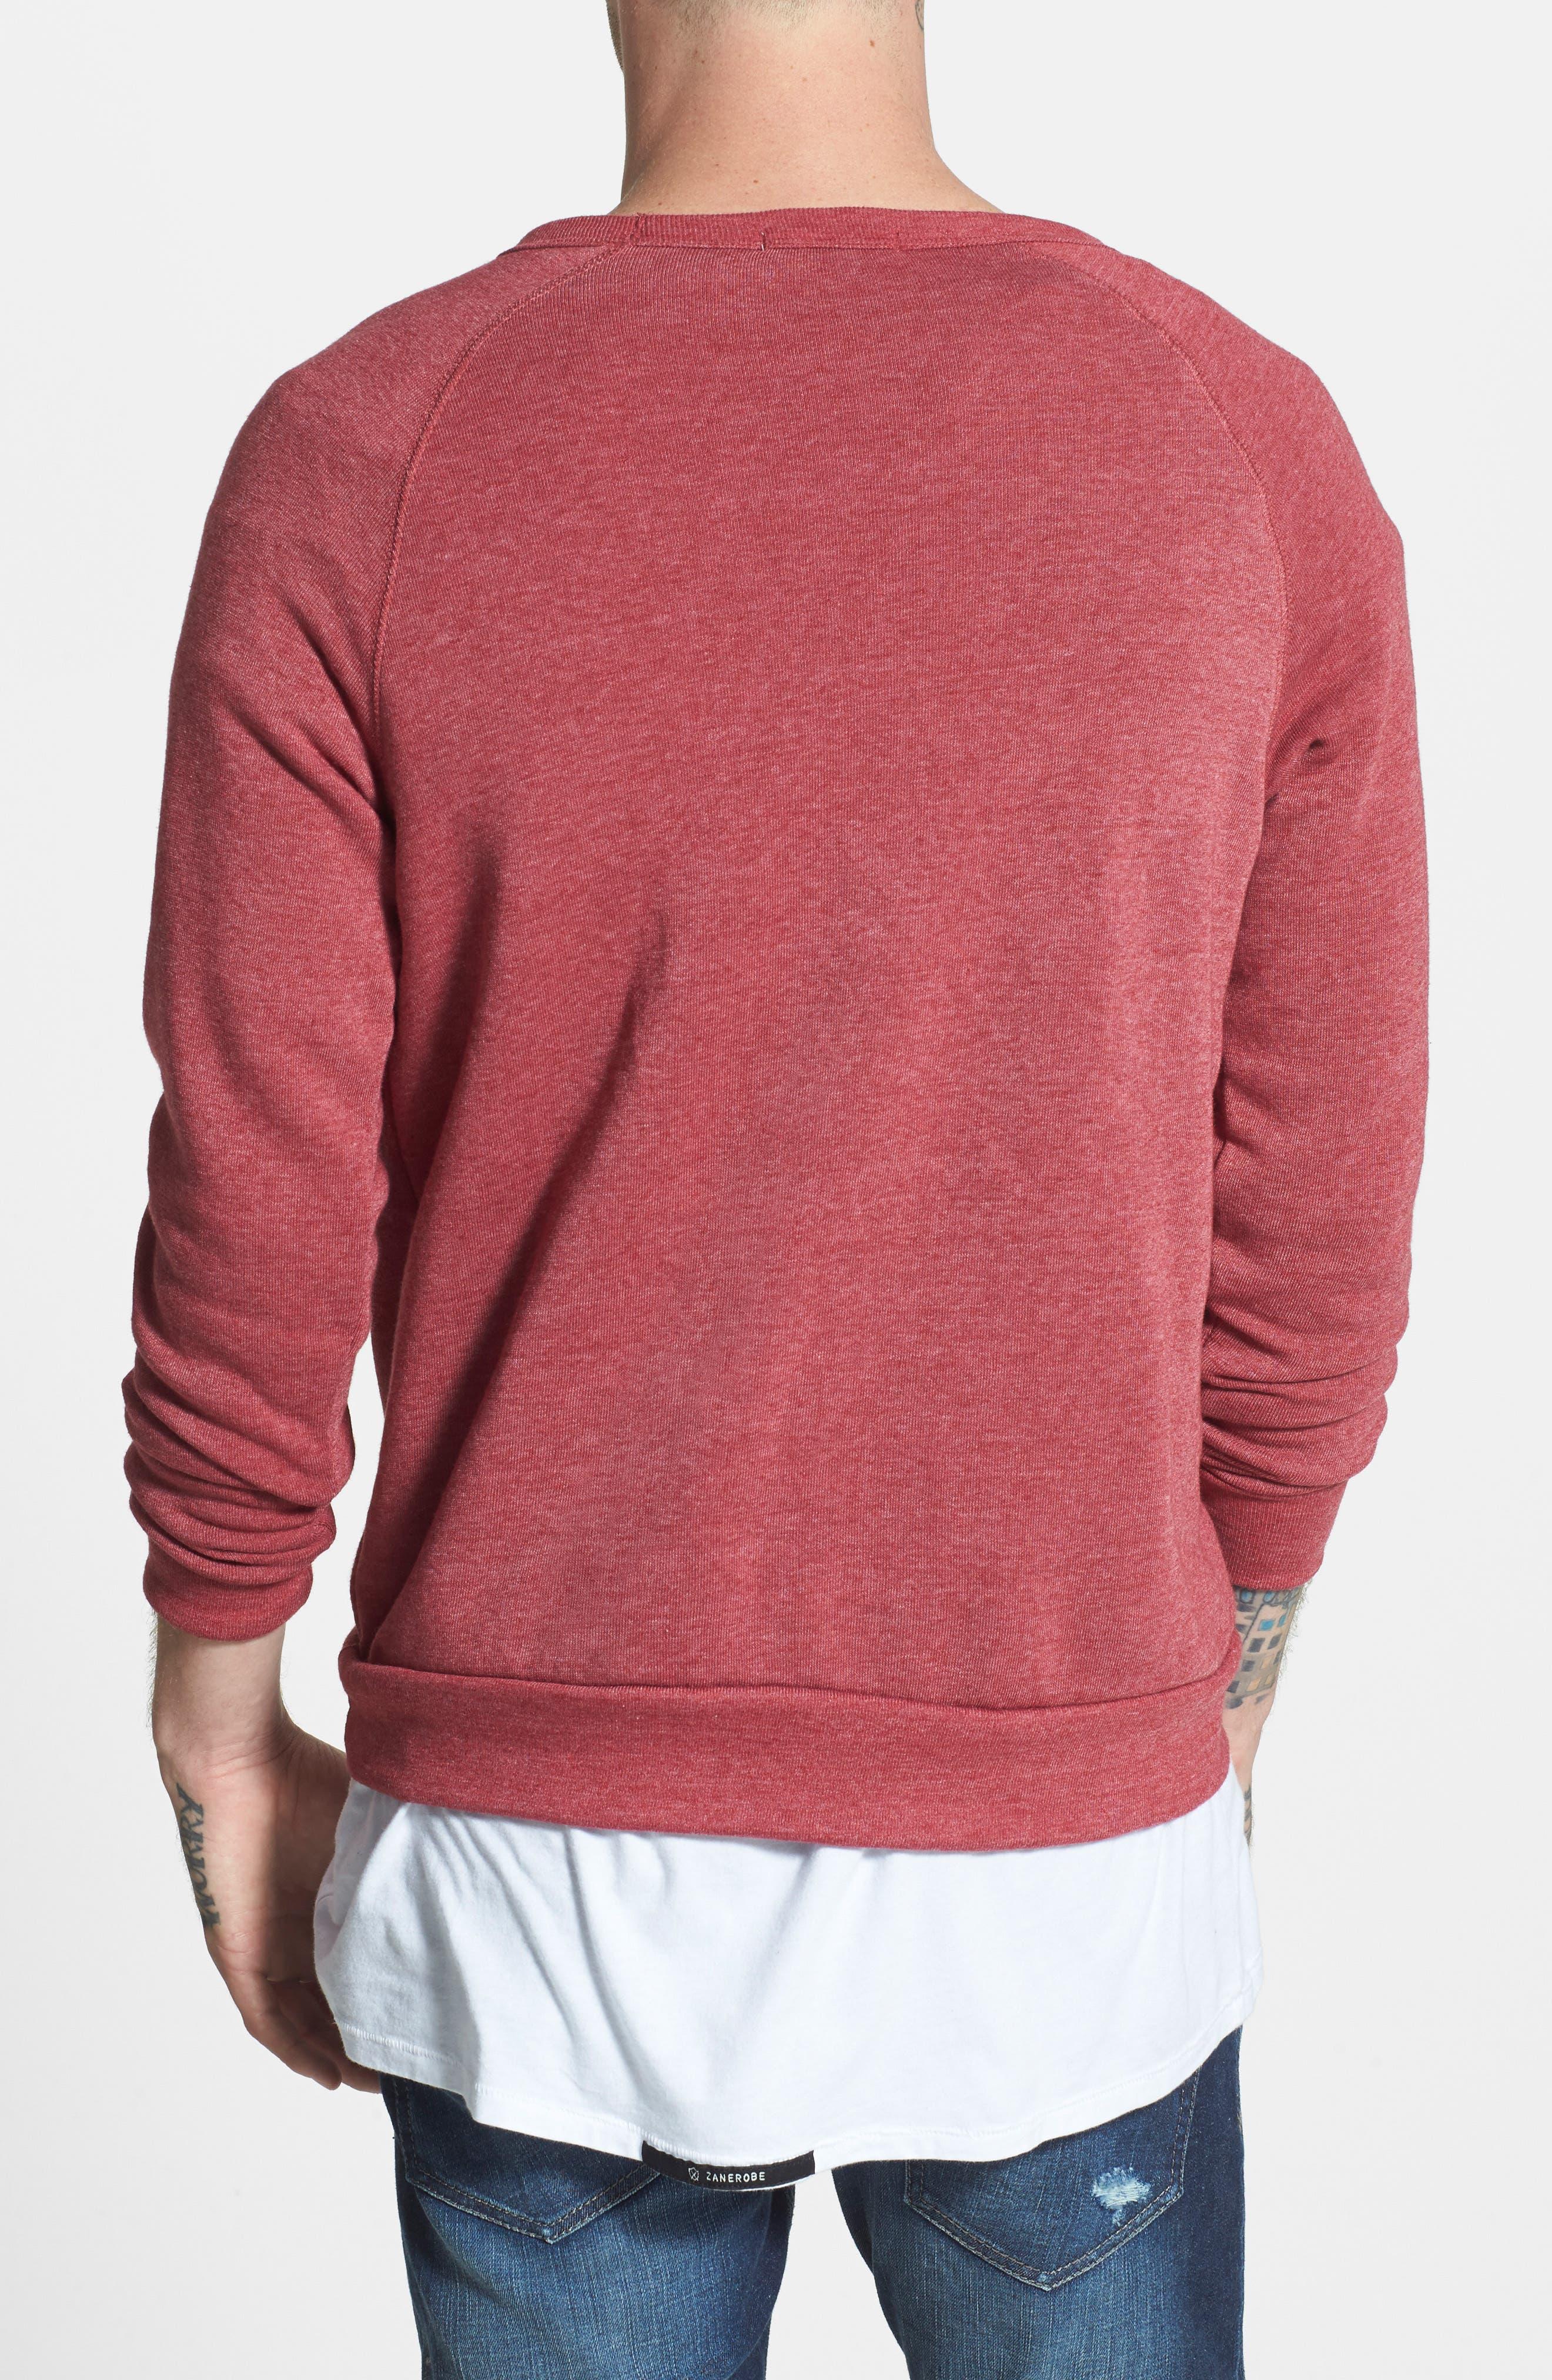 'The Champ' Sweatshirt,                             Alternate thumbnail 59, color,